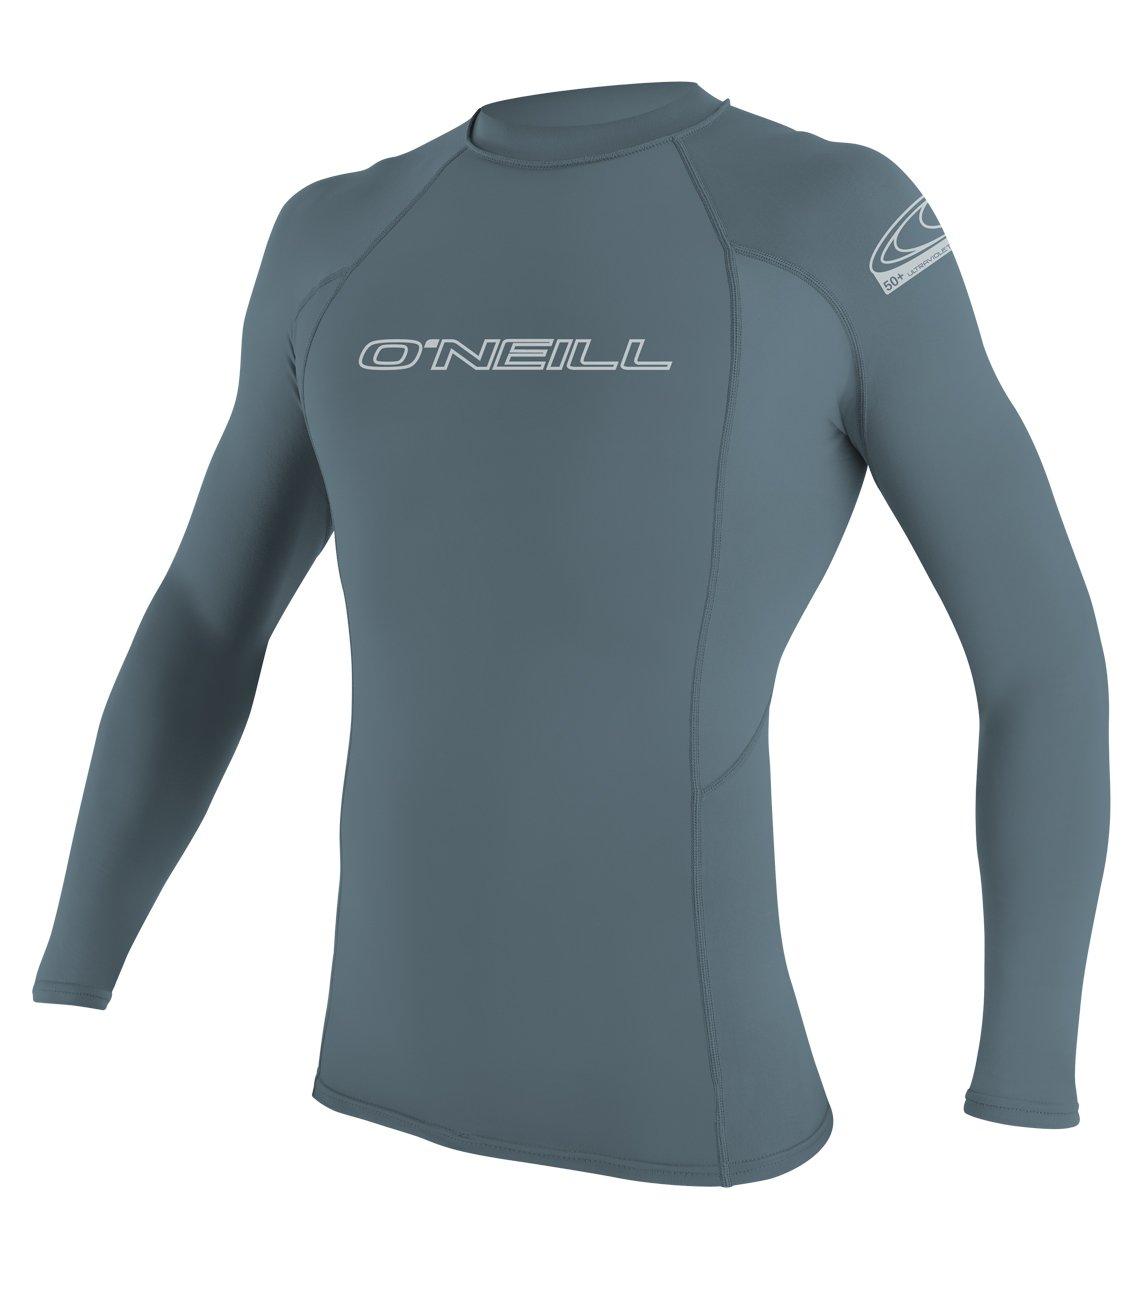 O'Neill Men's Basic Skins UPF 50+ Long Sleeve Rash Guard, Dusty Blue, Medium